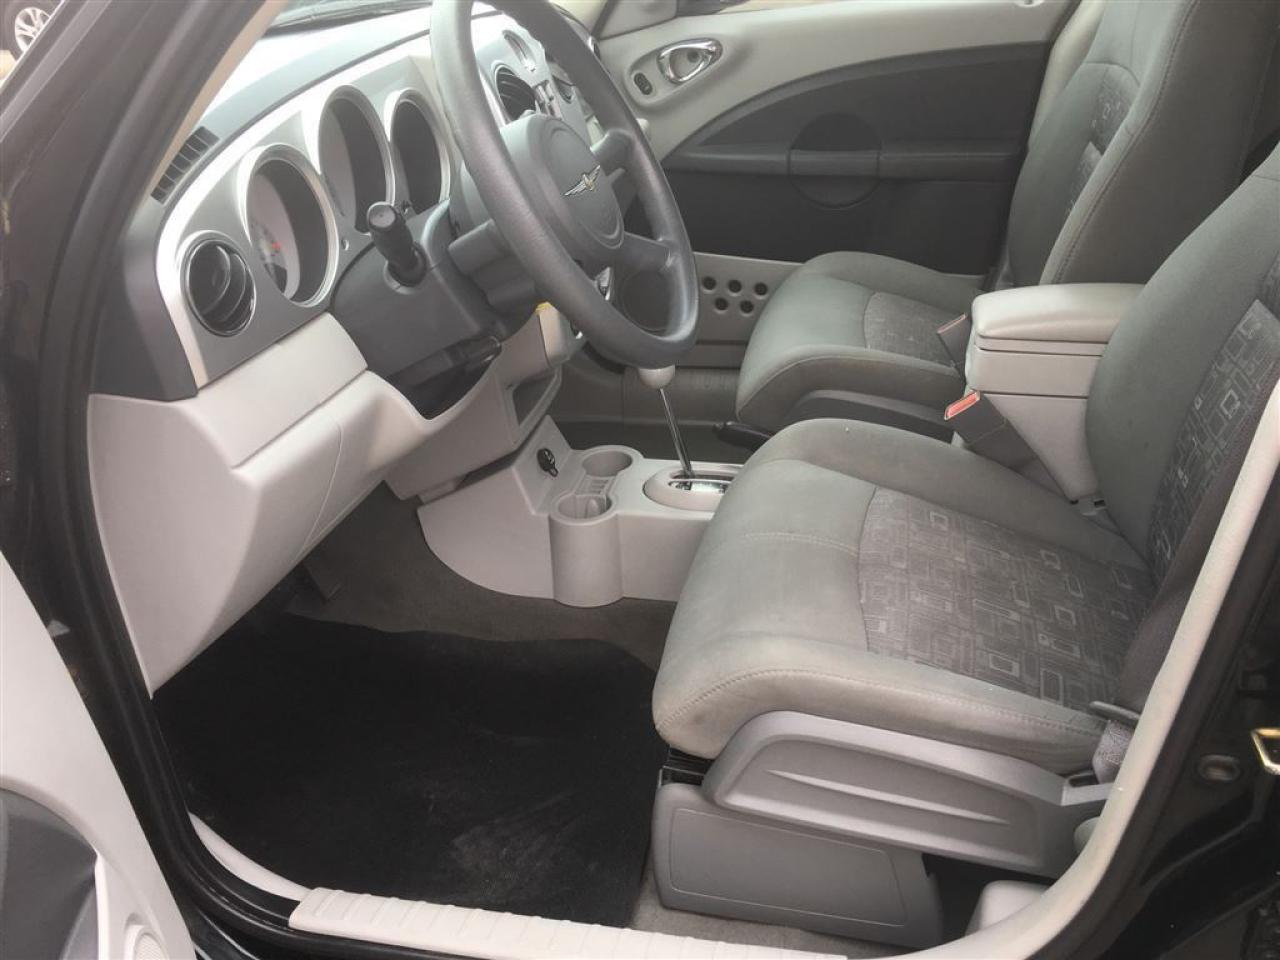 2006 Chrysler PT Cruiser Base/PRICED FOR A QUICK SALE!